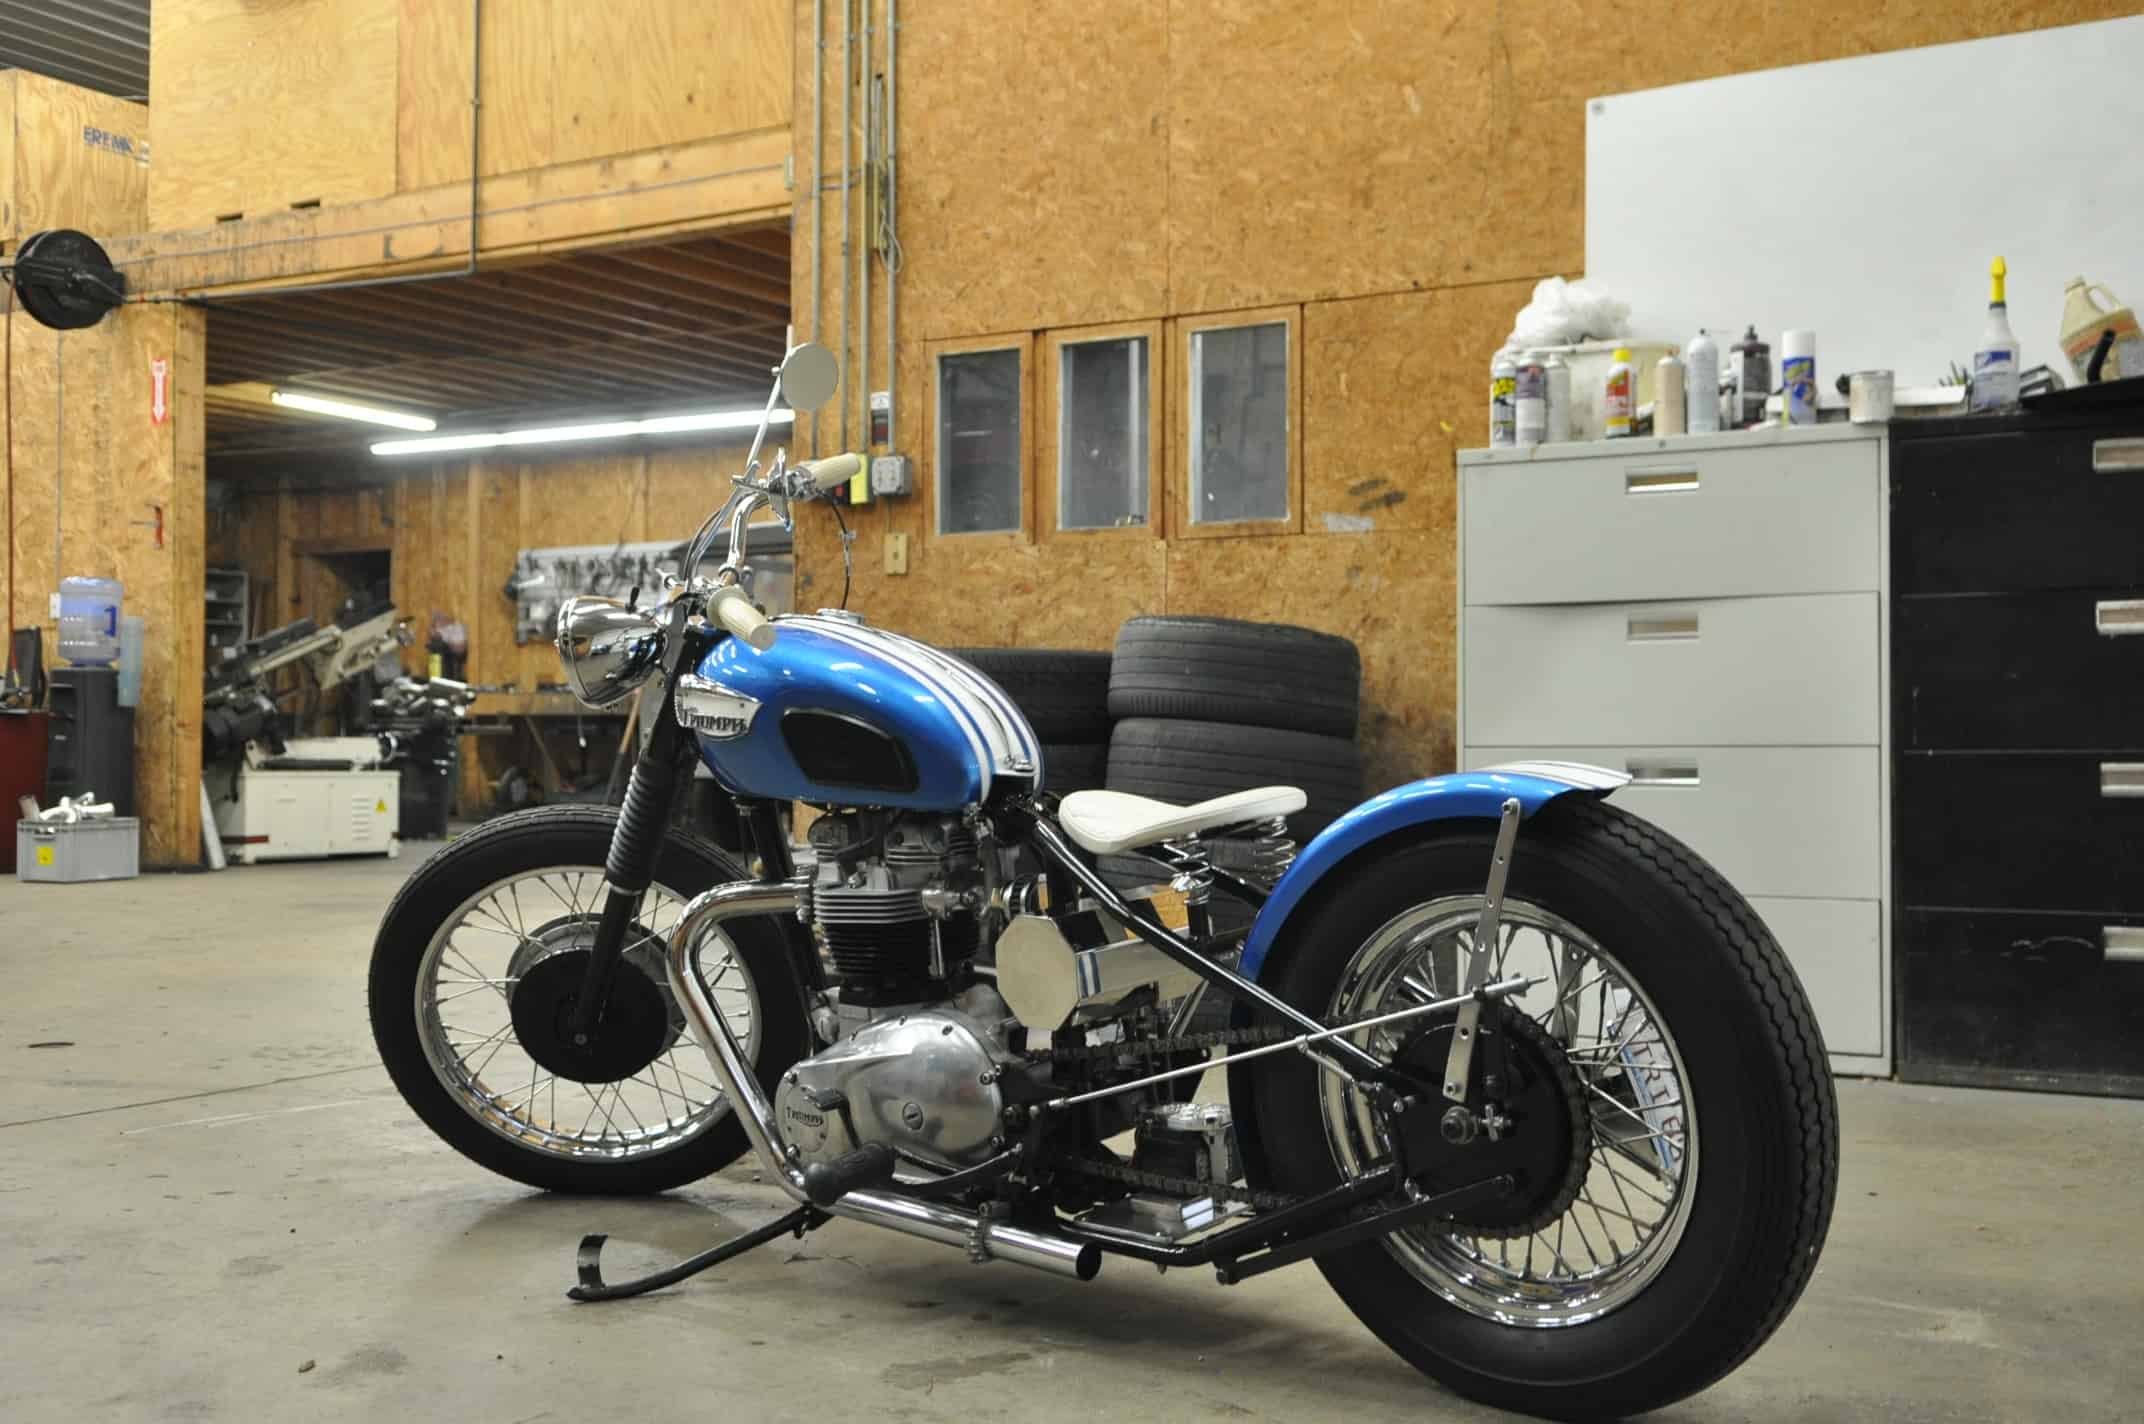 1968 Triumph Bonneville Motorcycle Fabrication kickstand bobber